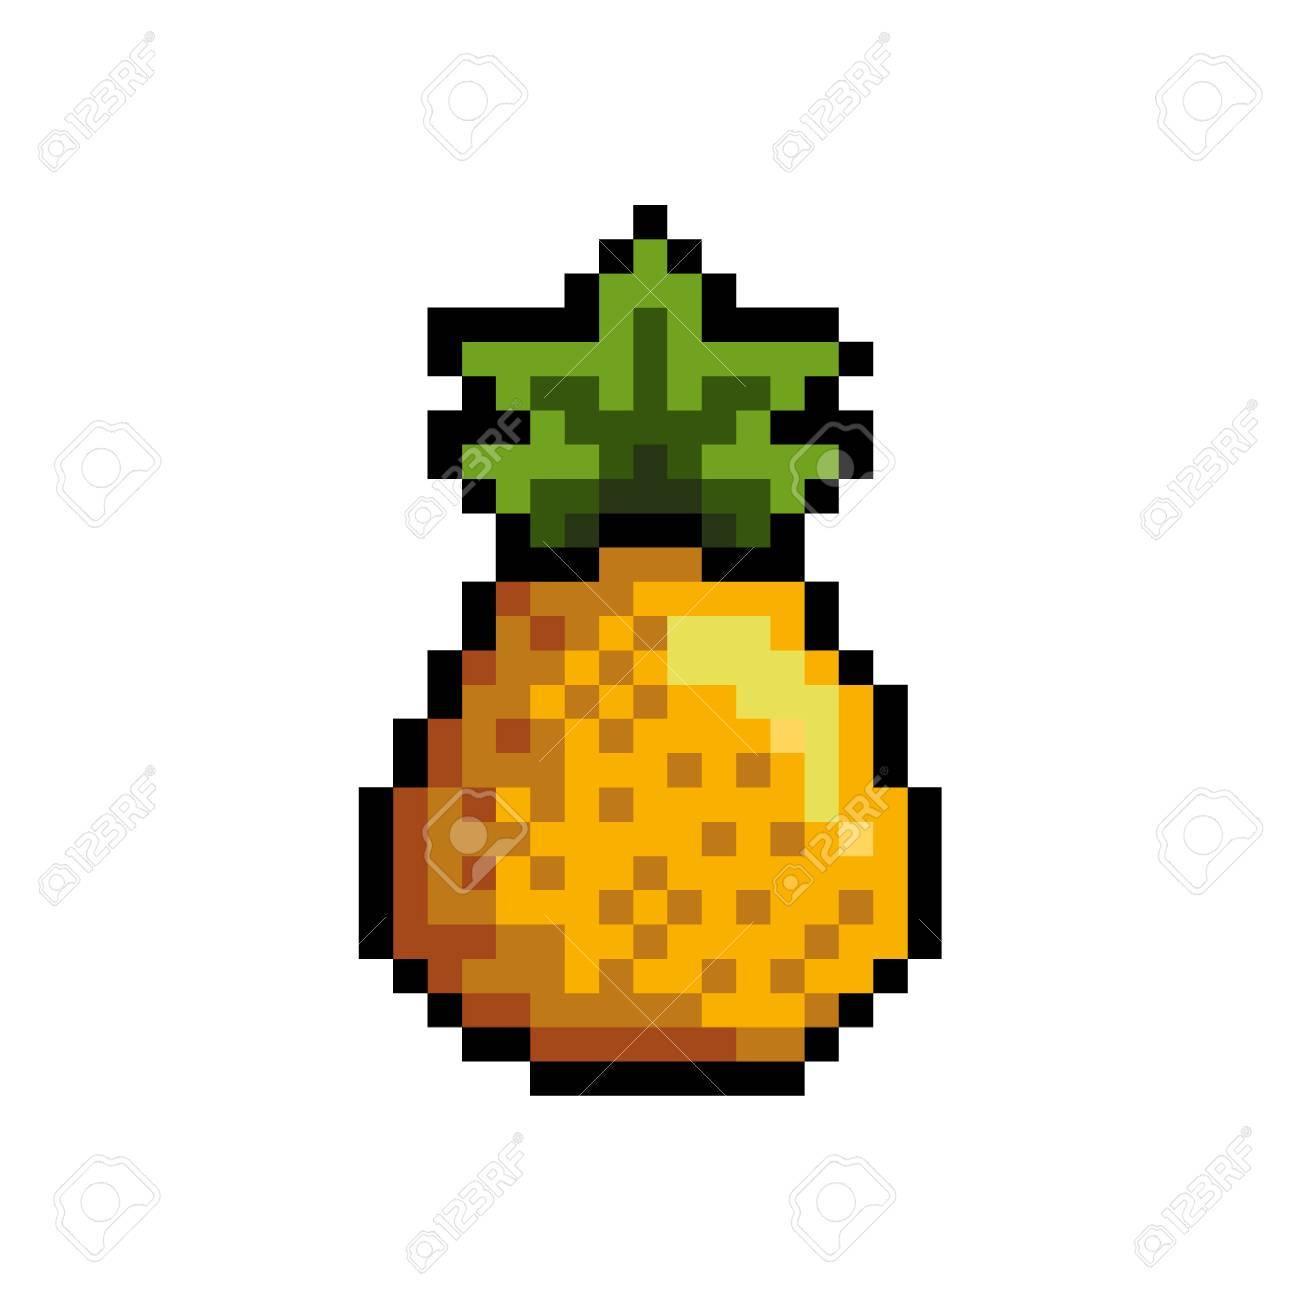 Pixel Art Pineapple